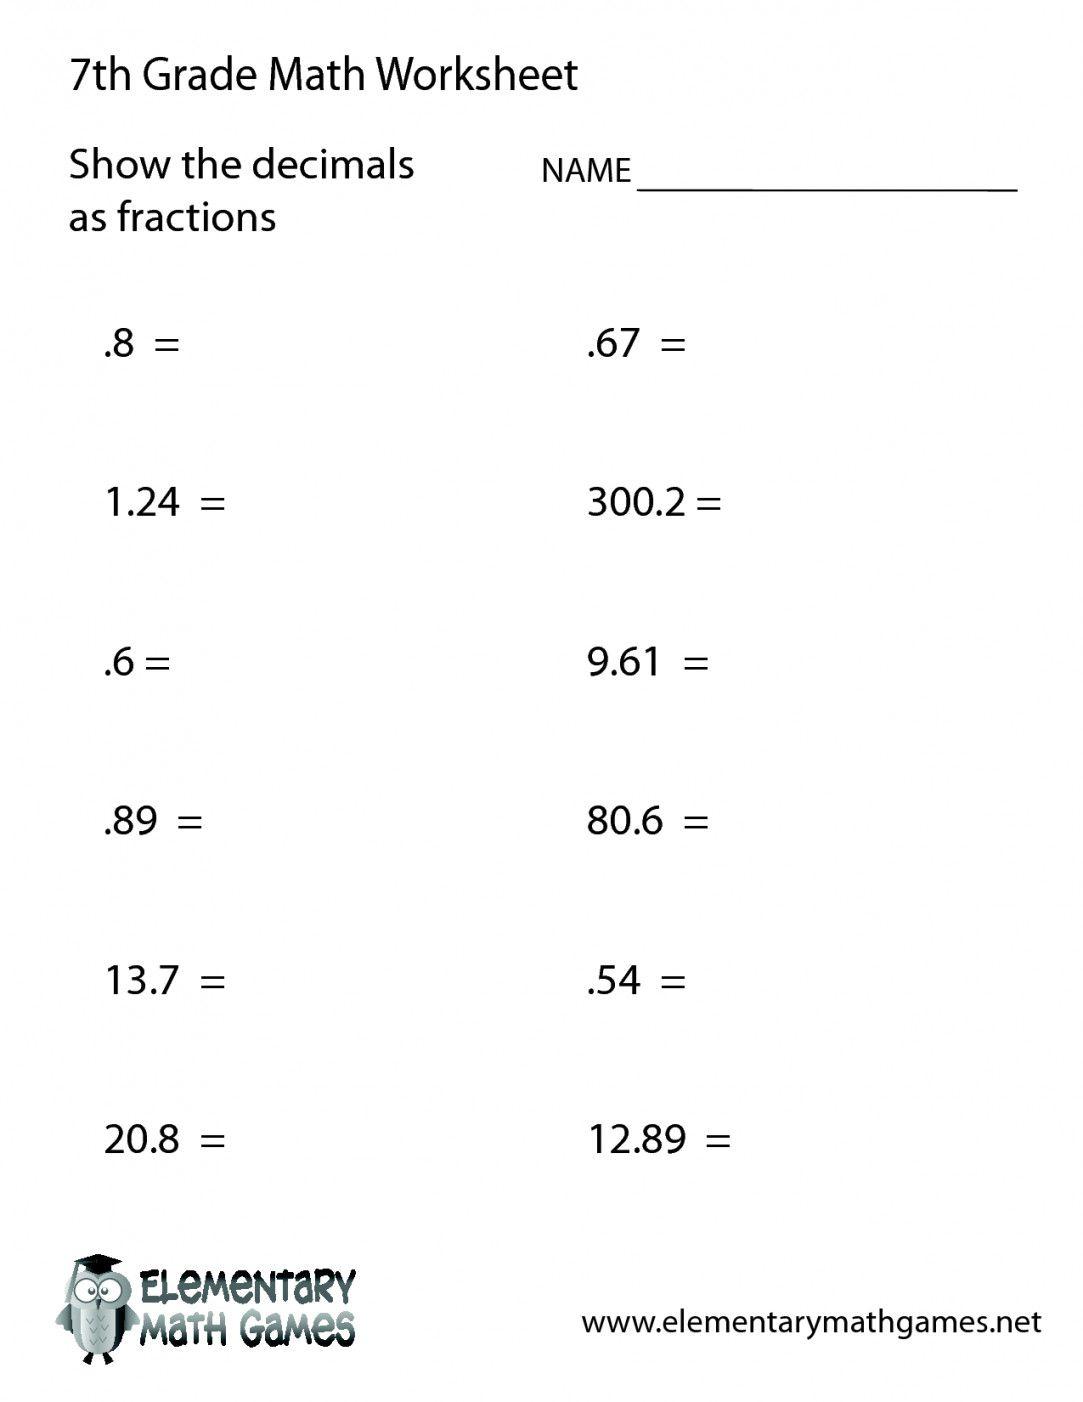 Free Printable 7Th Grade Math Worksheets | Lostranquillos - Free | 7Th Grade Math Worksheets Printable